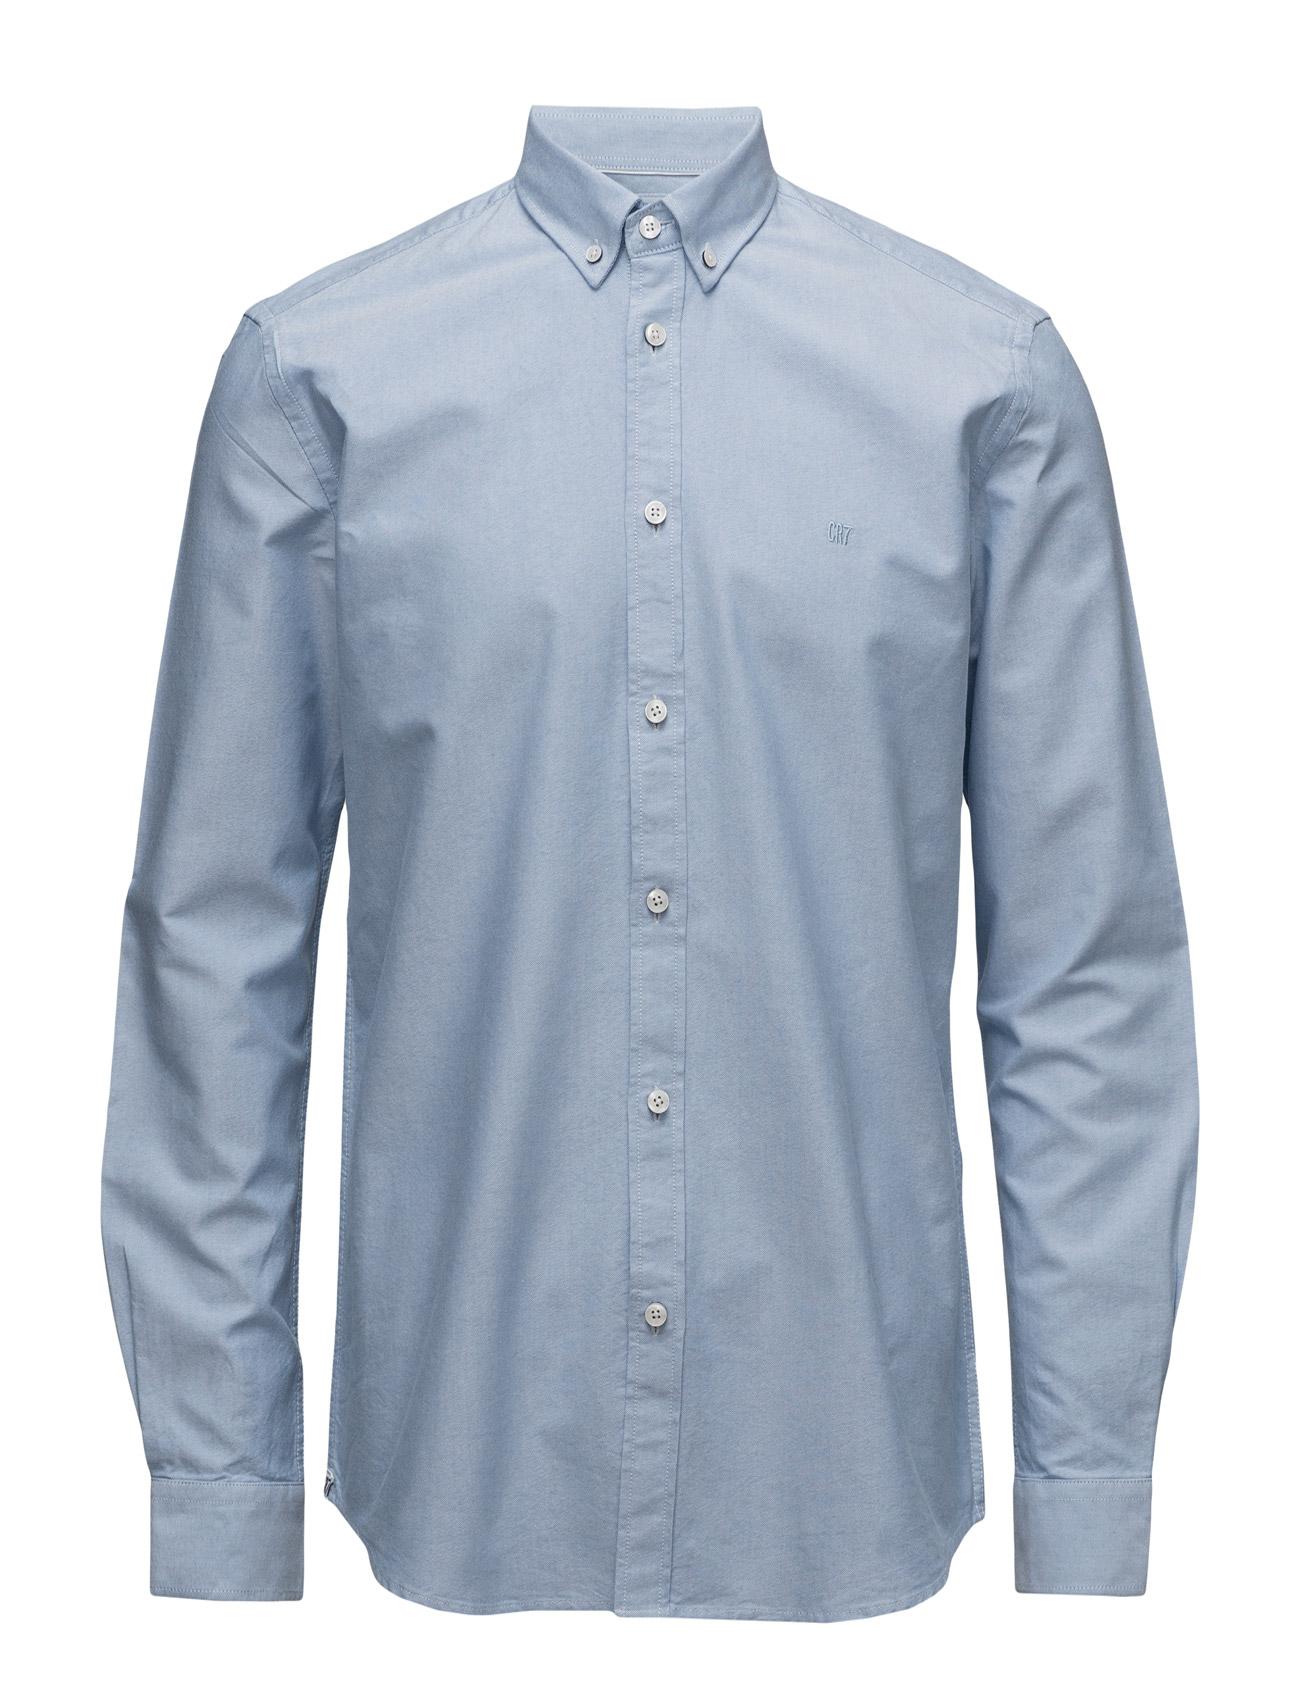 Cr7 Shirt Classic Fit Oxford CR7 Affärs